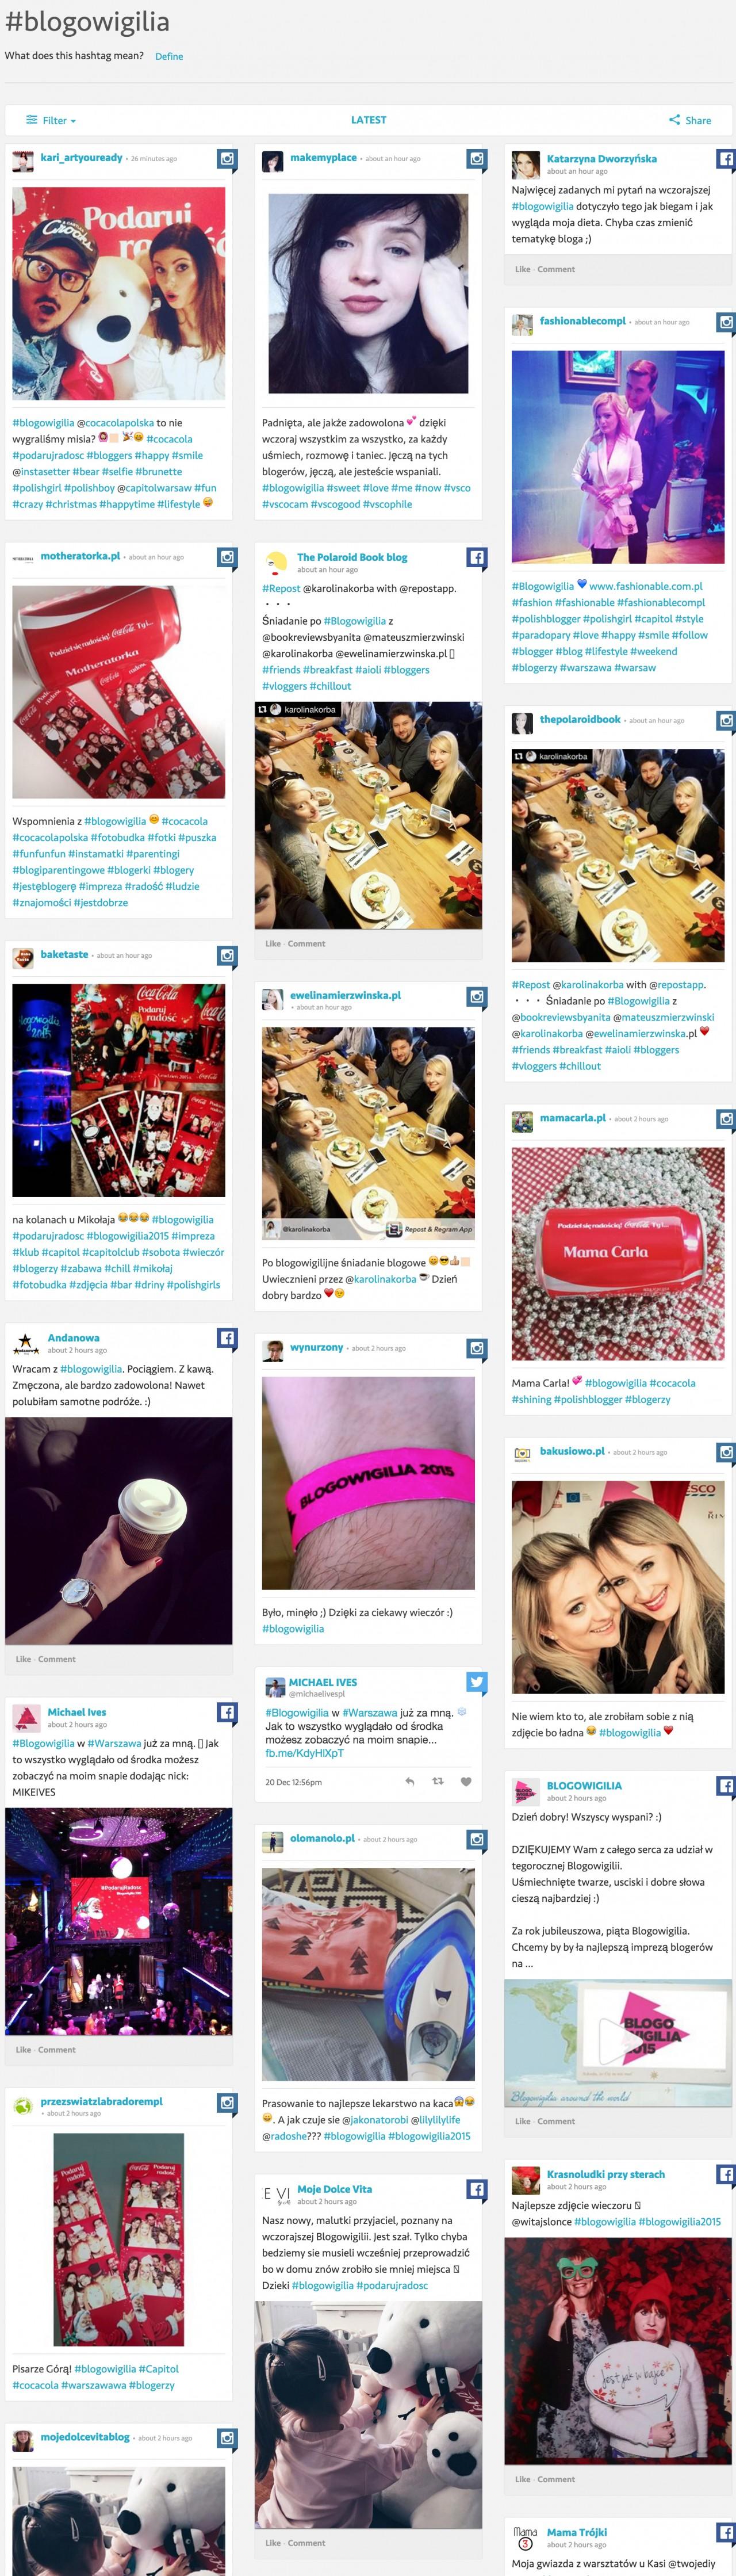 blogowigilia 2015 tagboard